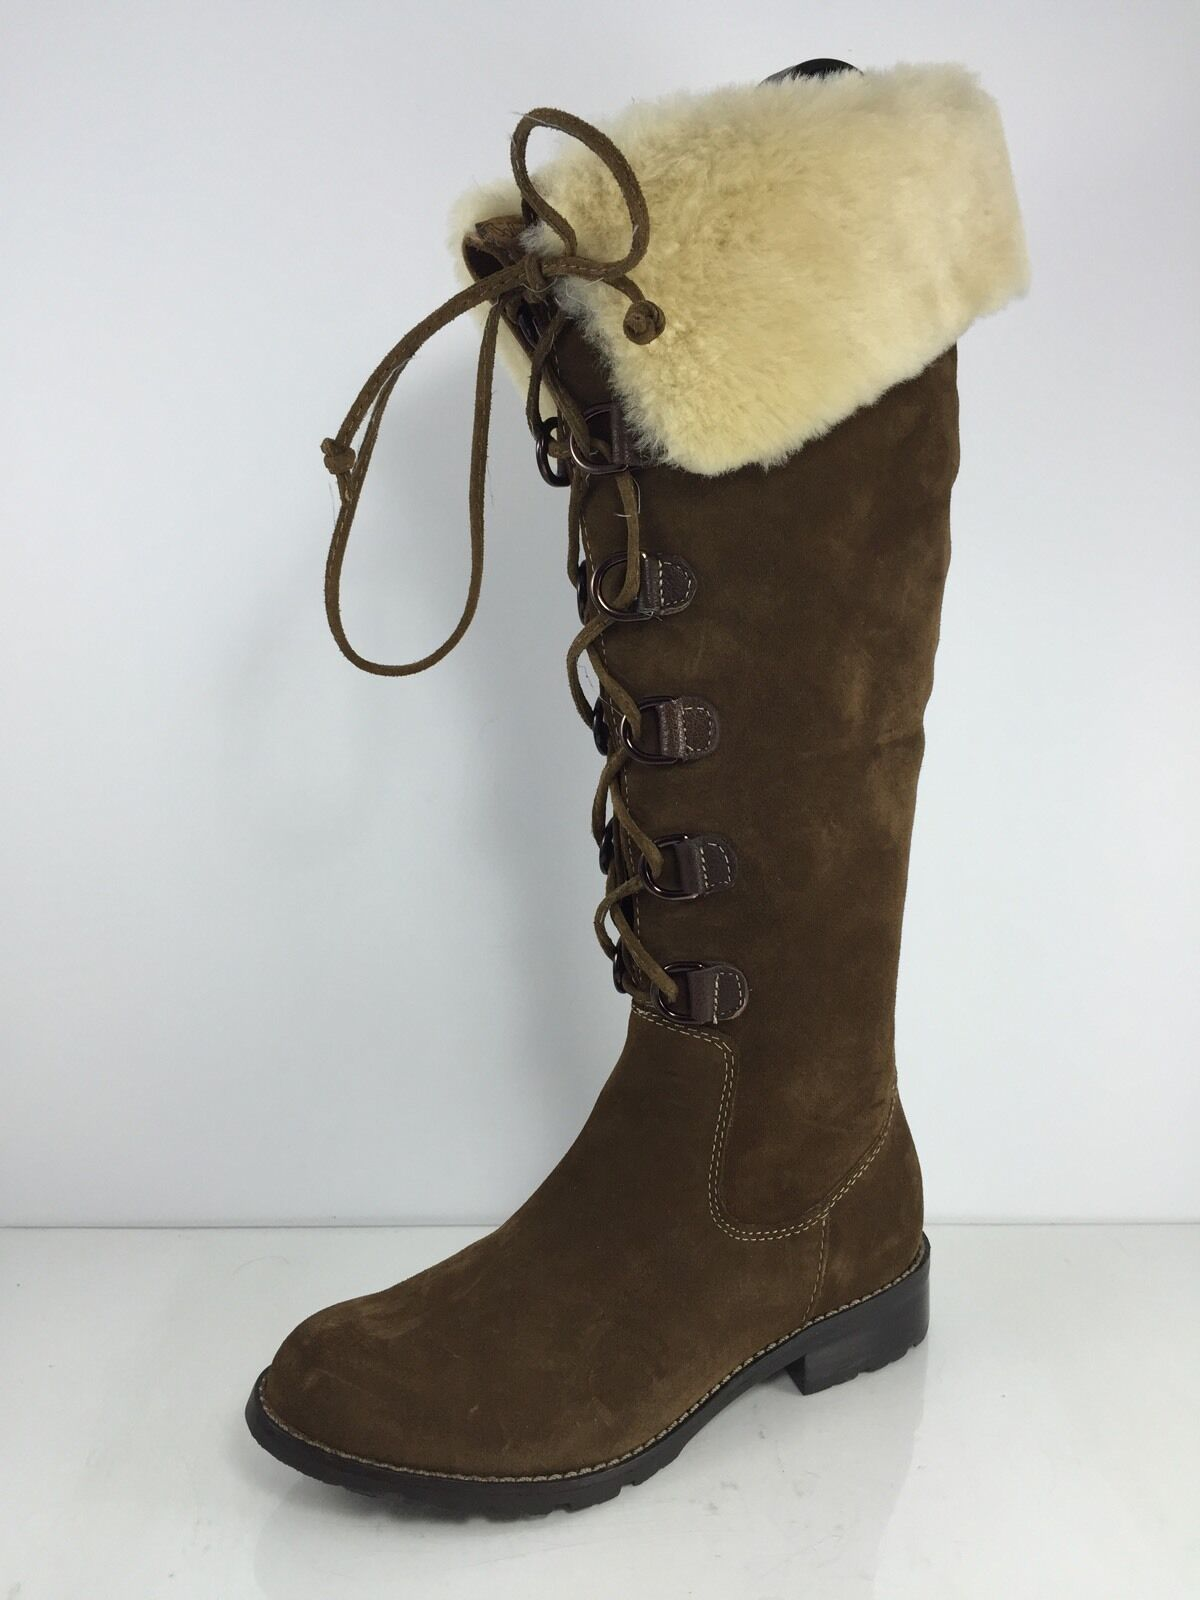 Sofft Damenschuhe Braun Leder Stiefel 6.5 M